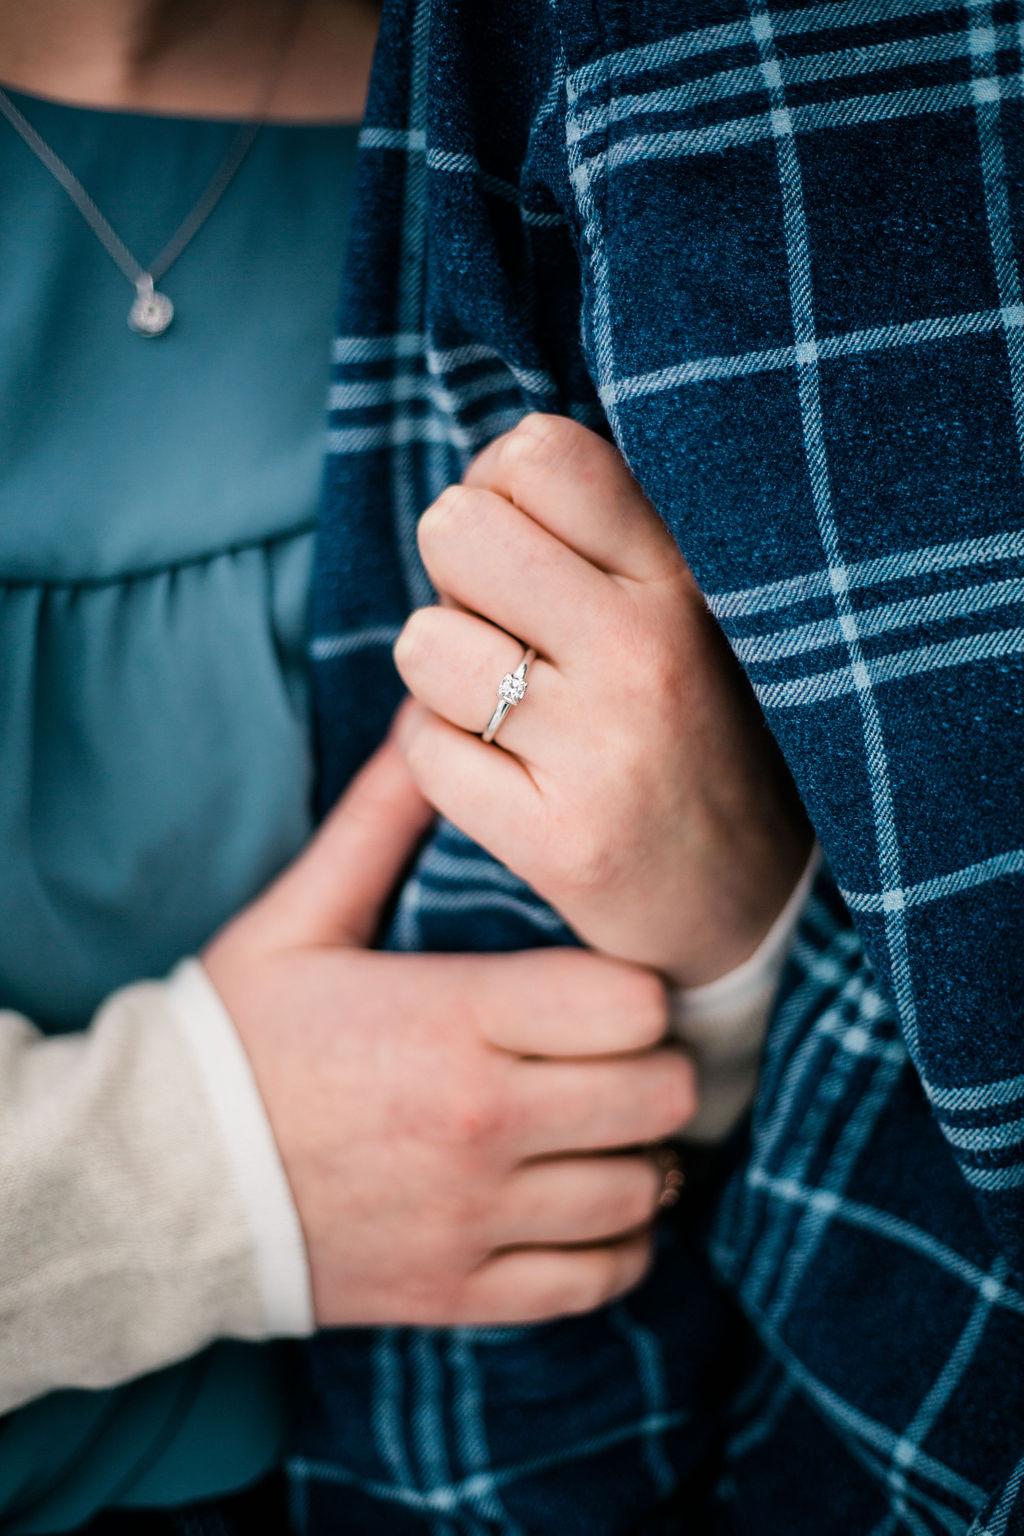 katie_graham_photography_wedding_photographer_bemus_point_chautauqua_lake_jamestown_lakewood_buffalo_new_york_erie_pennsylvania